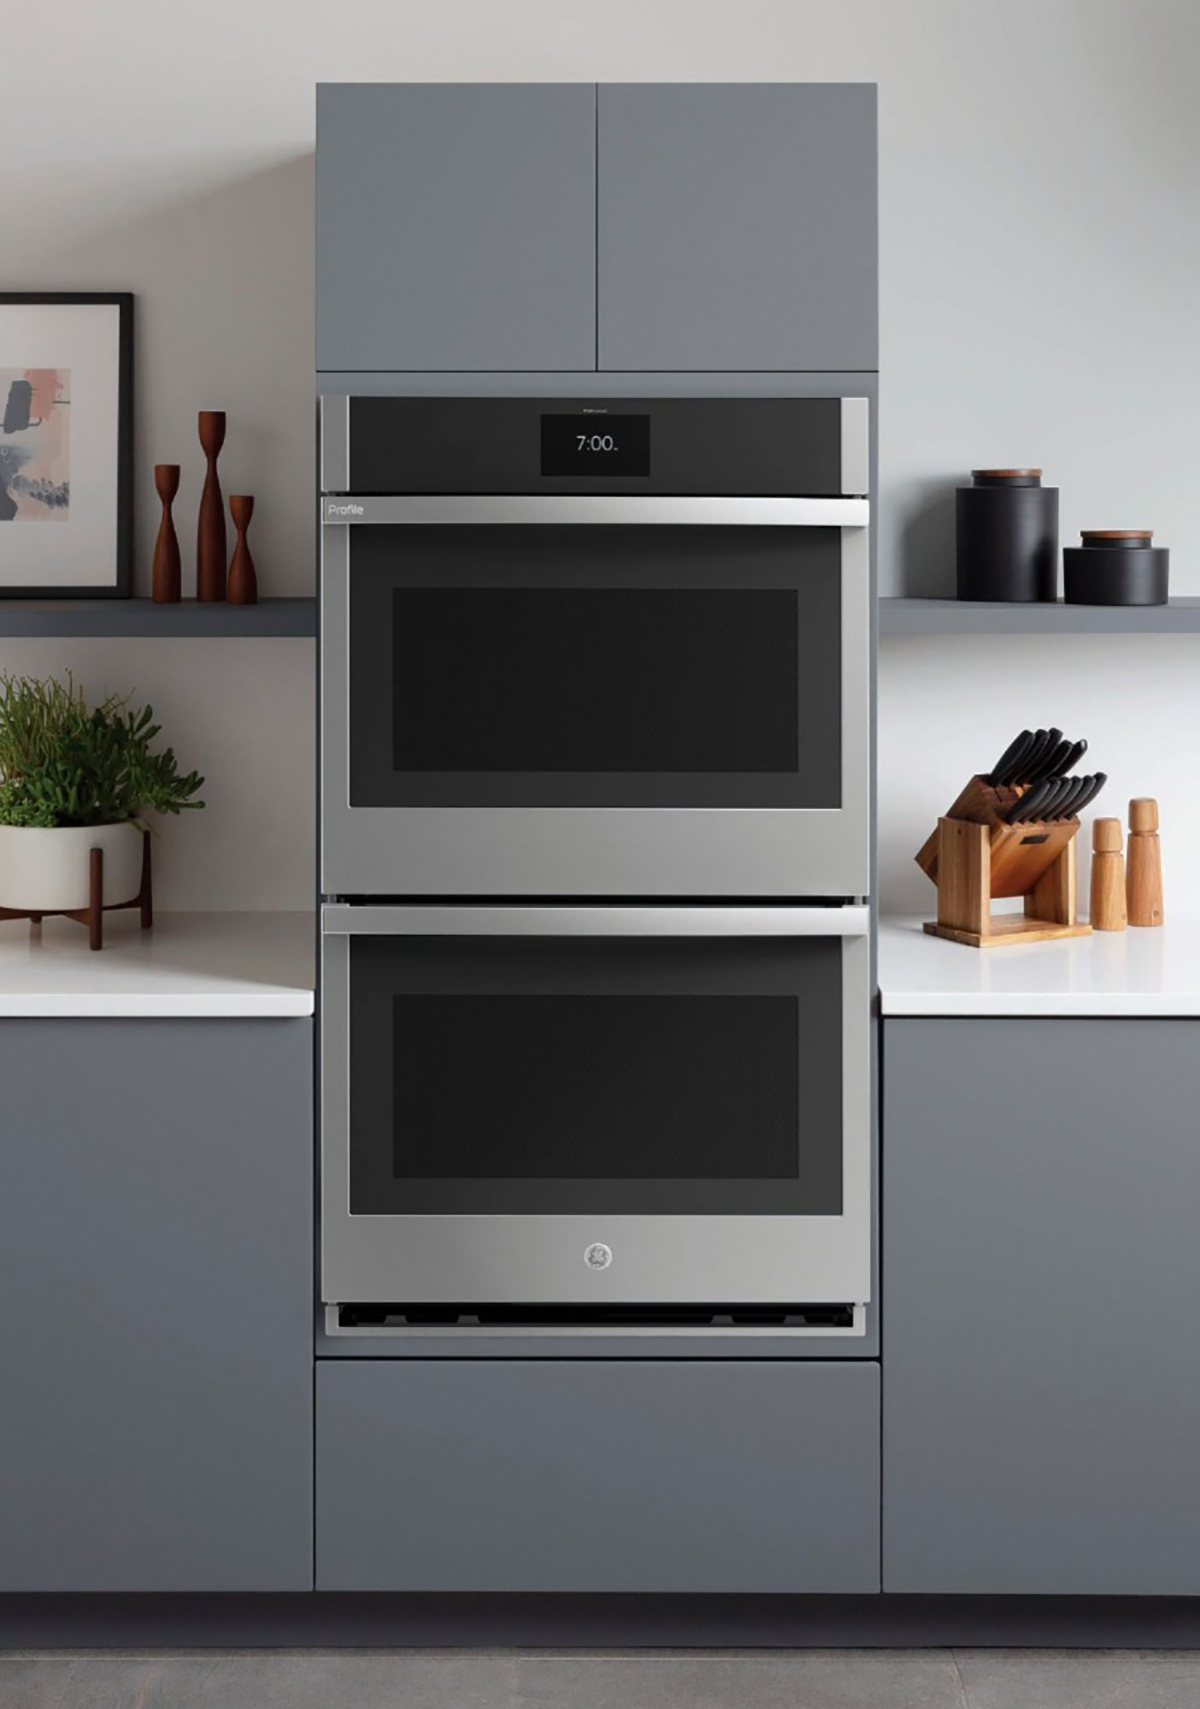 GE Profile Wall Oven